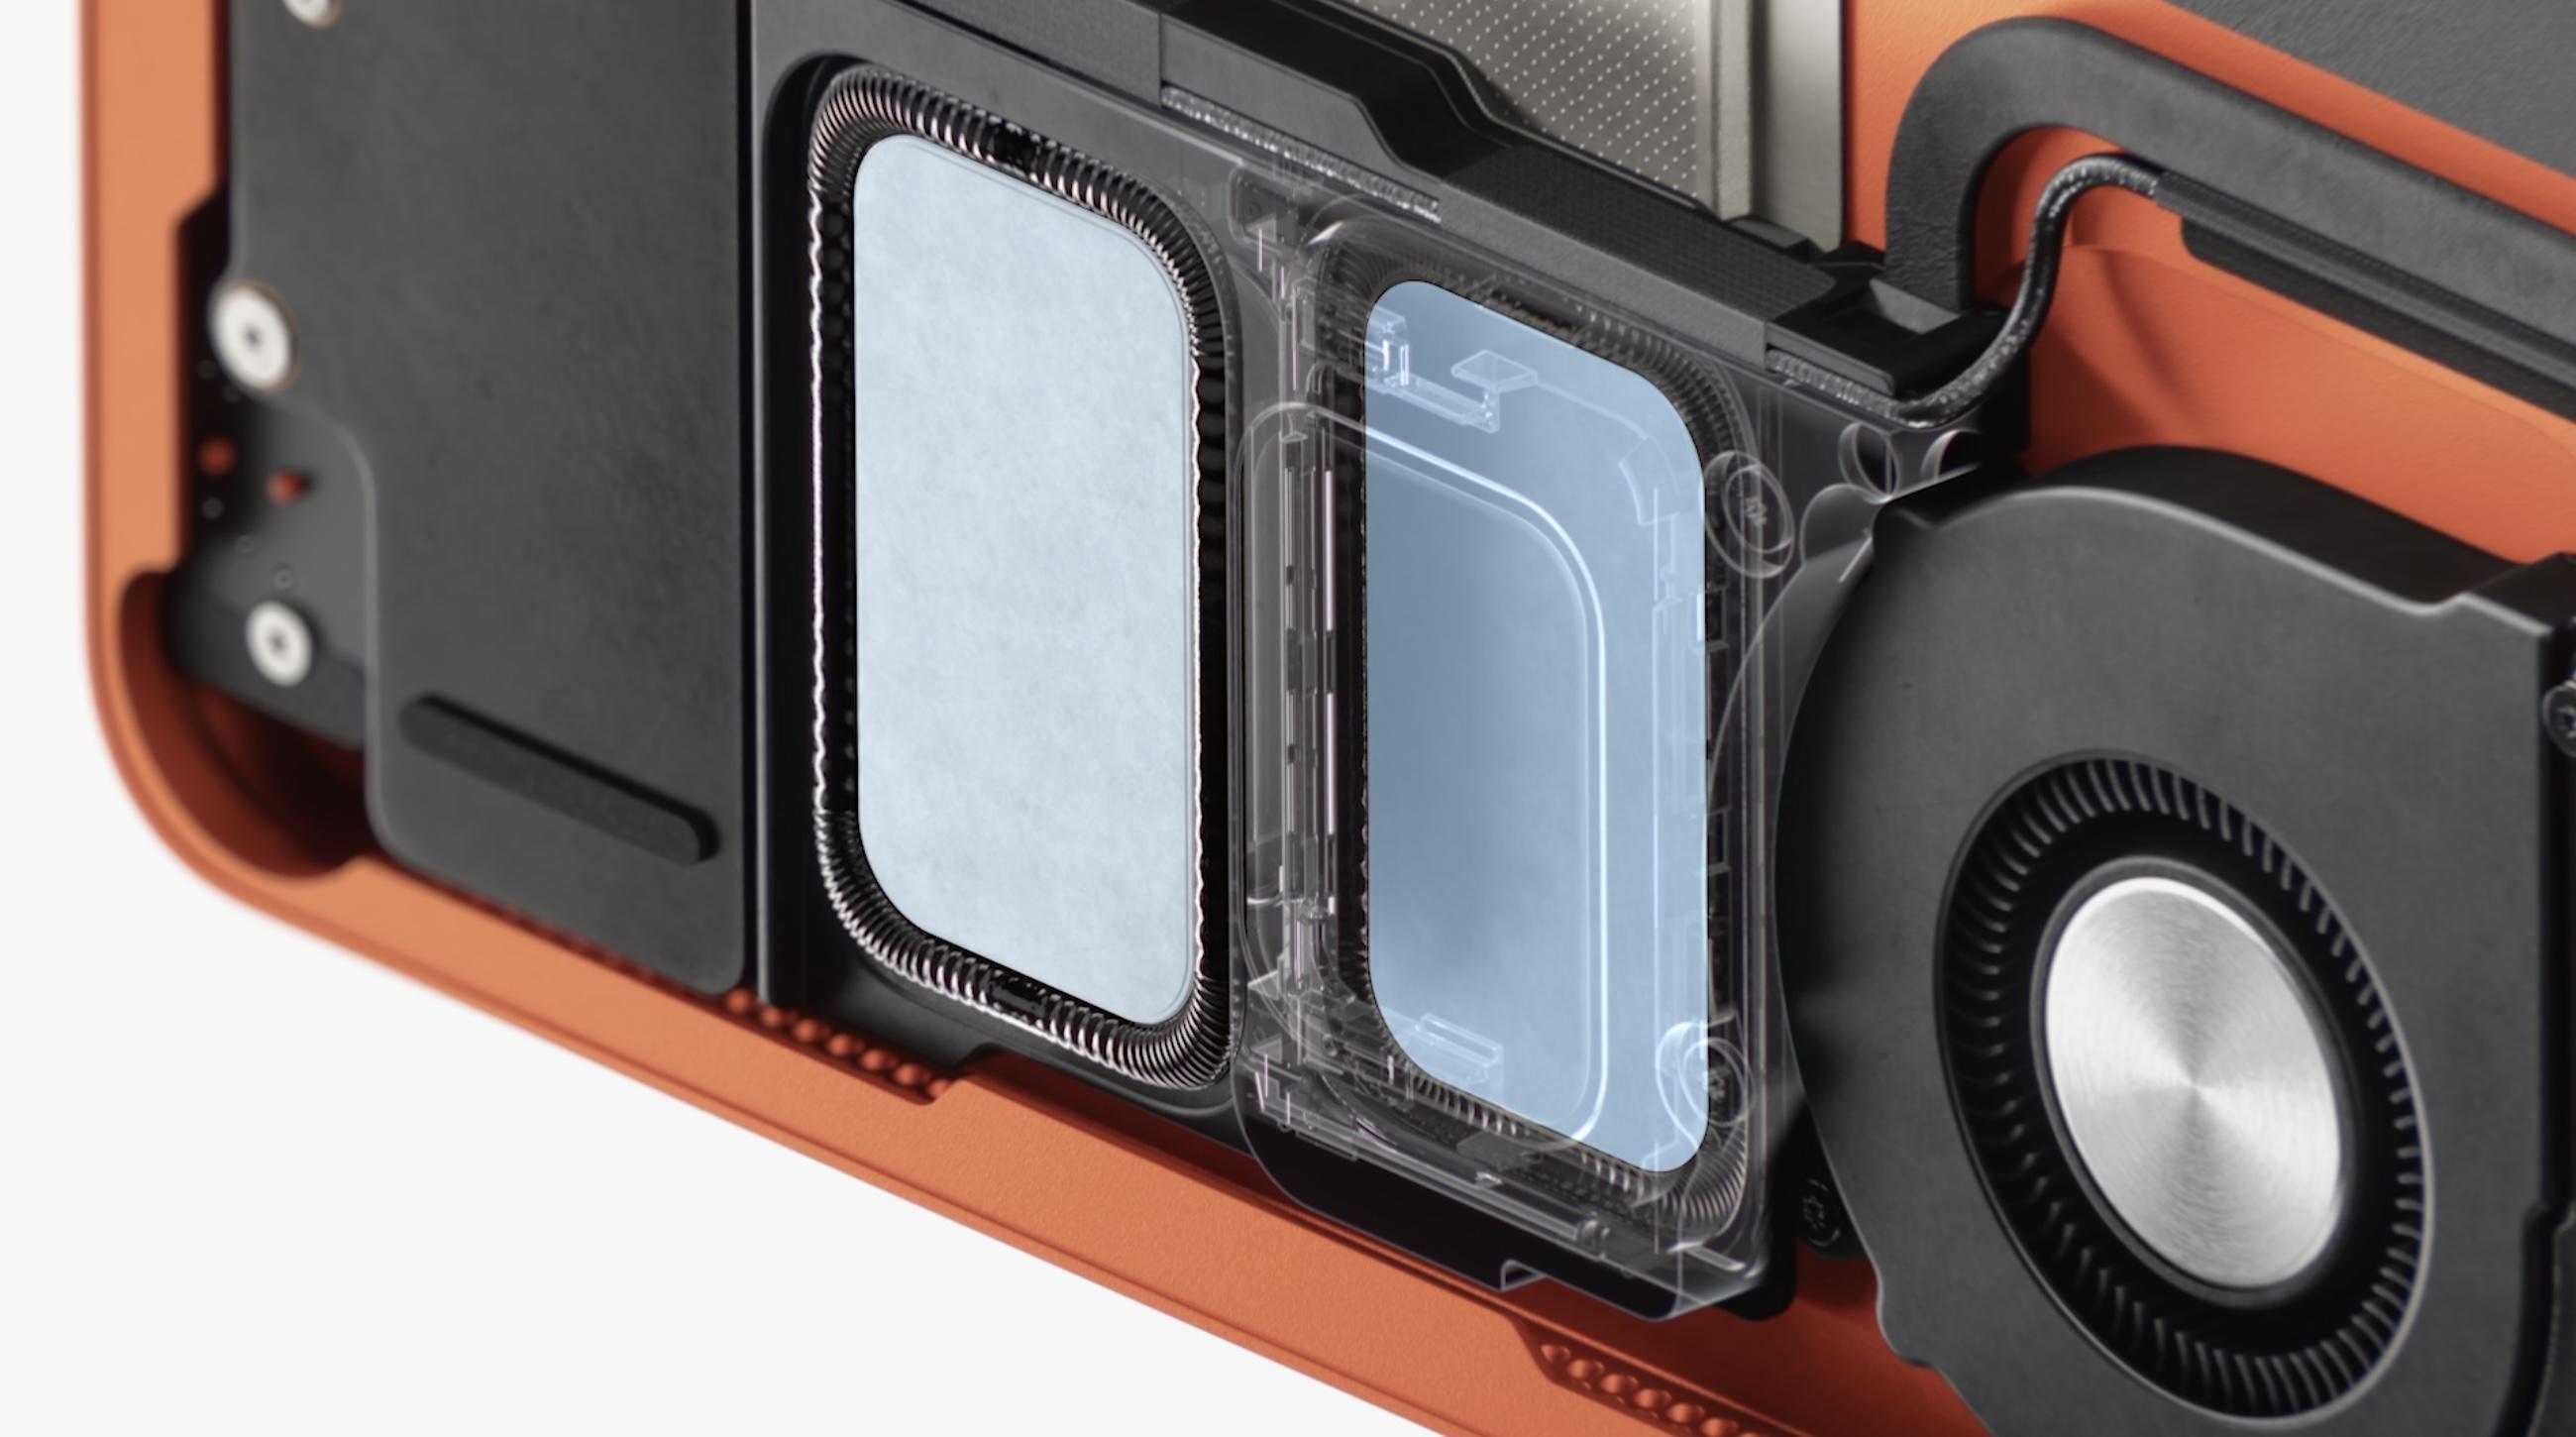 M1 iMac vs Intel iMac - Audio Comparison